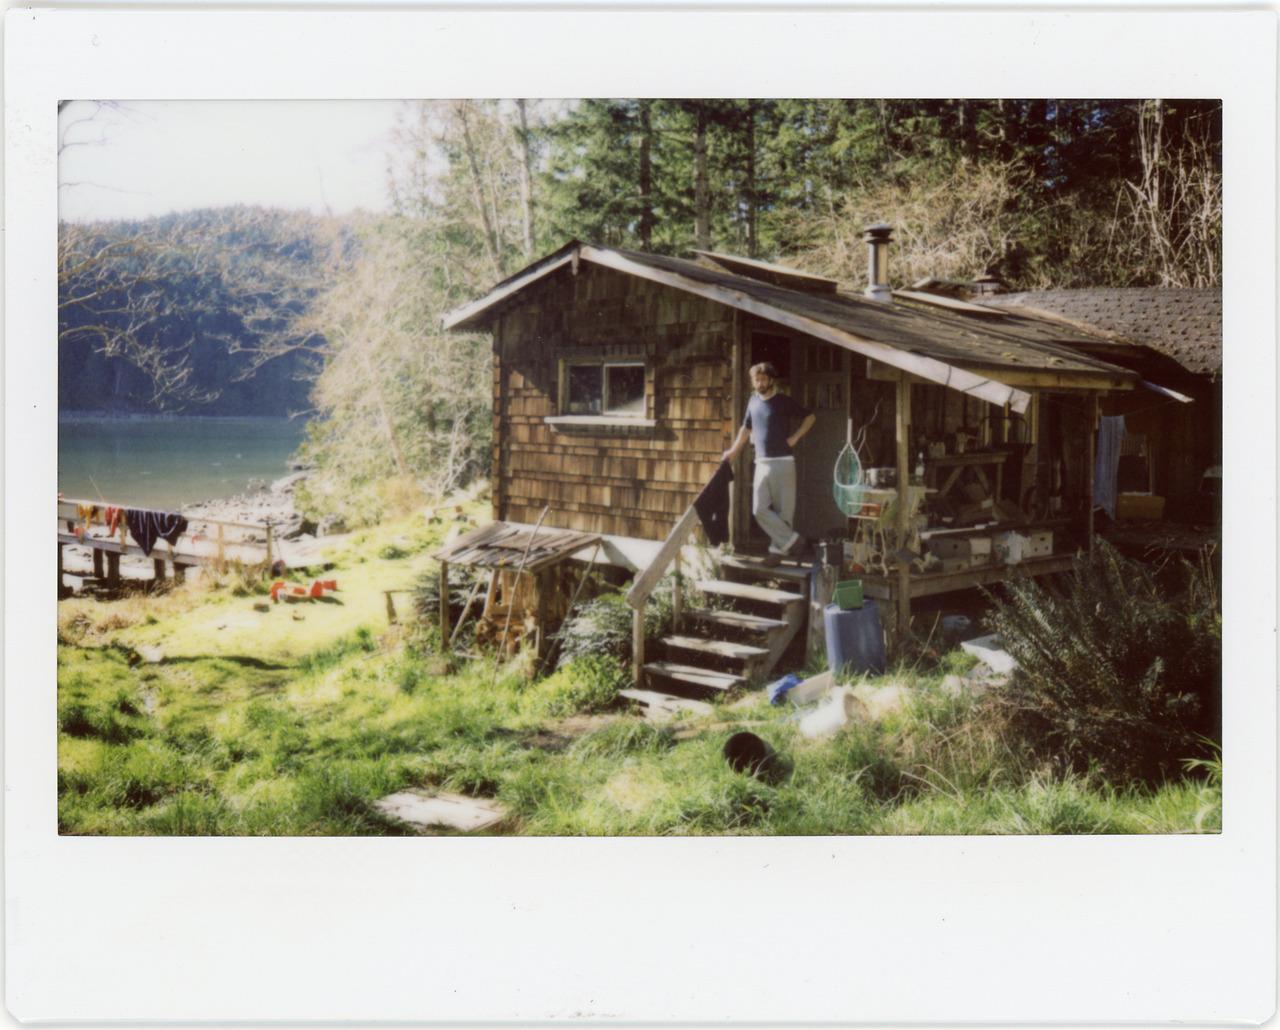 Lakeside cabins on Sonora Island, British Columbia.